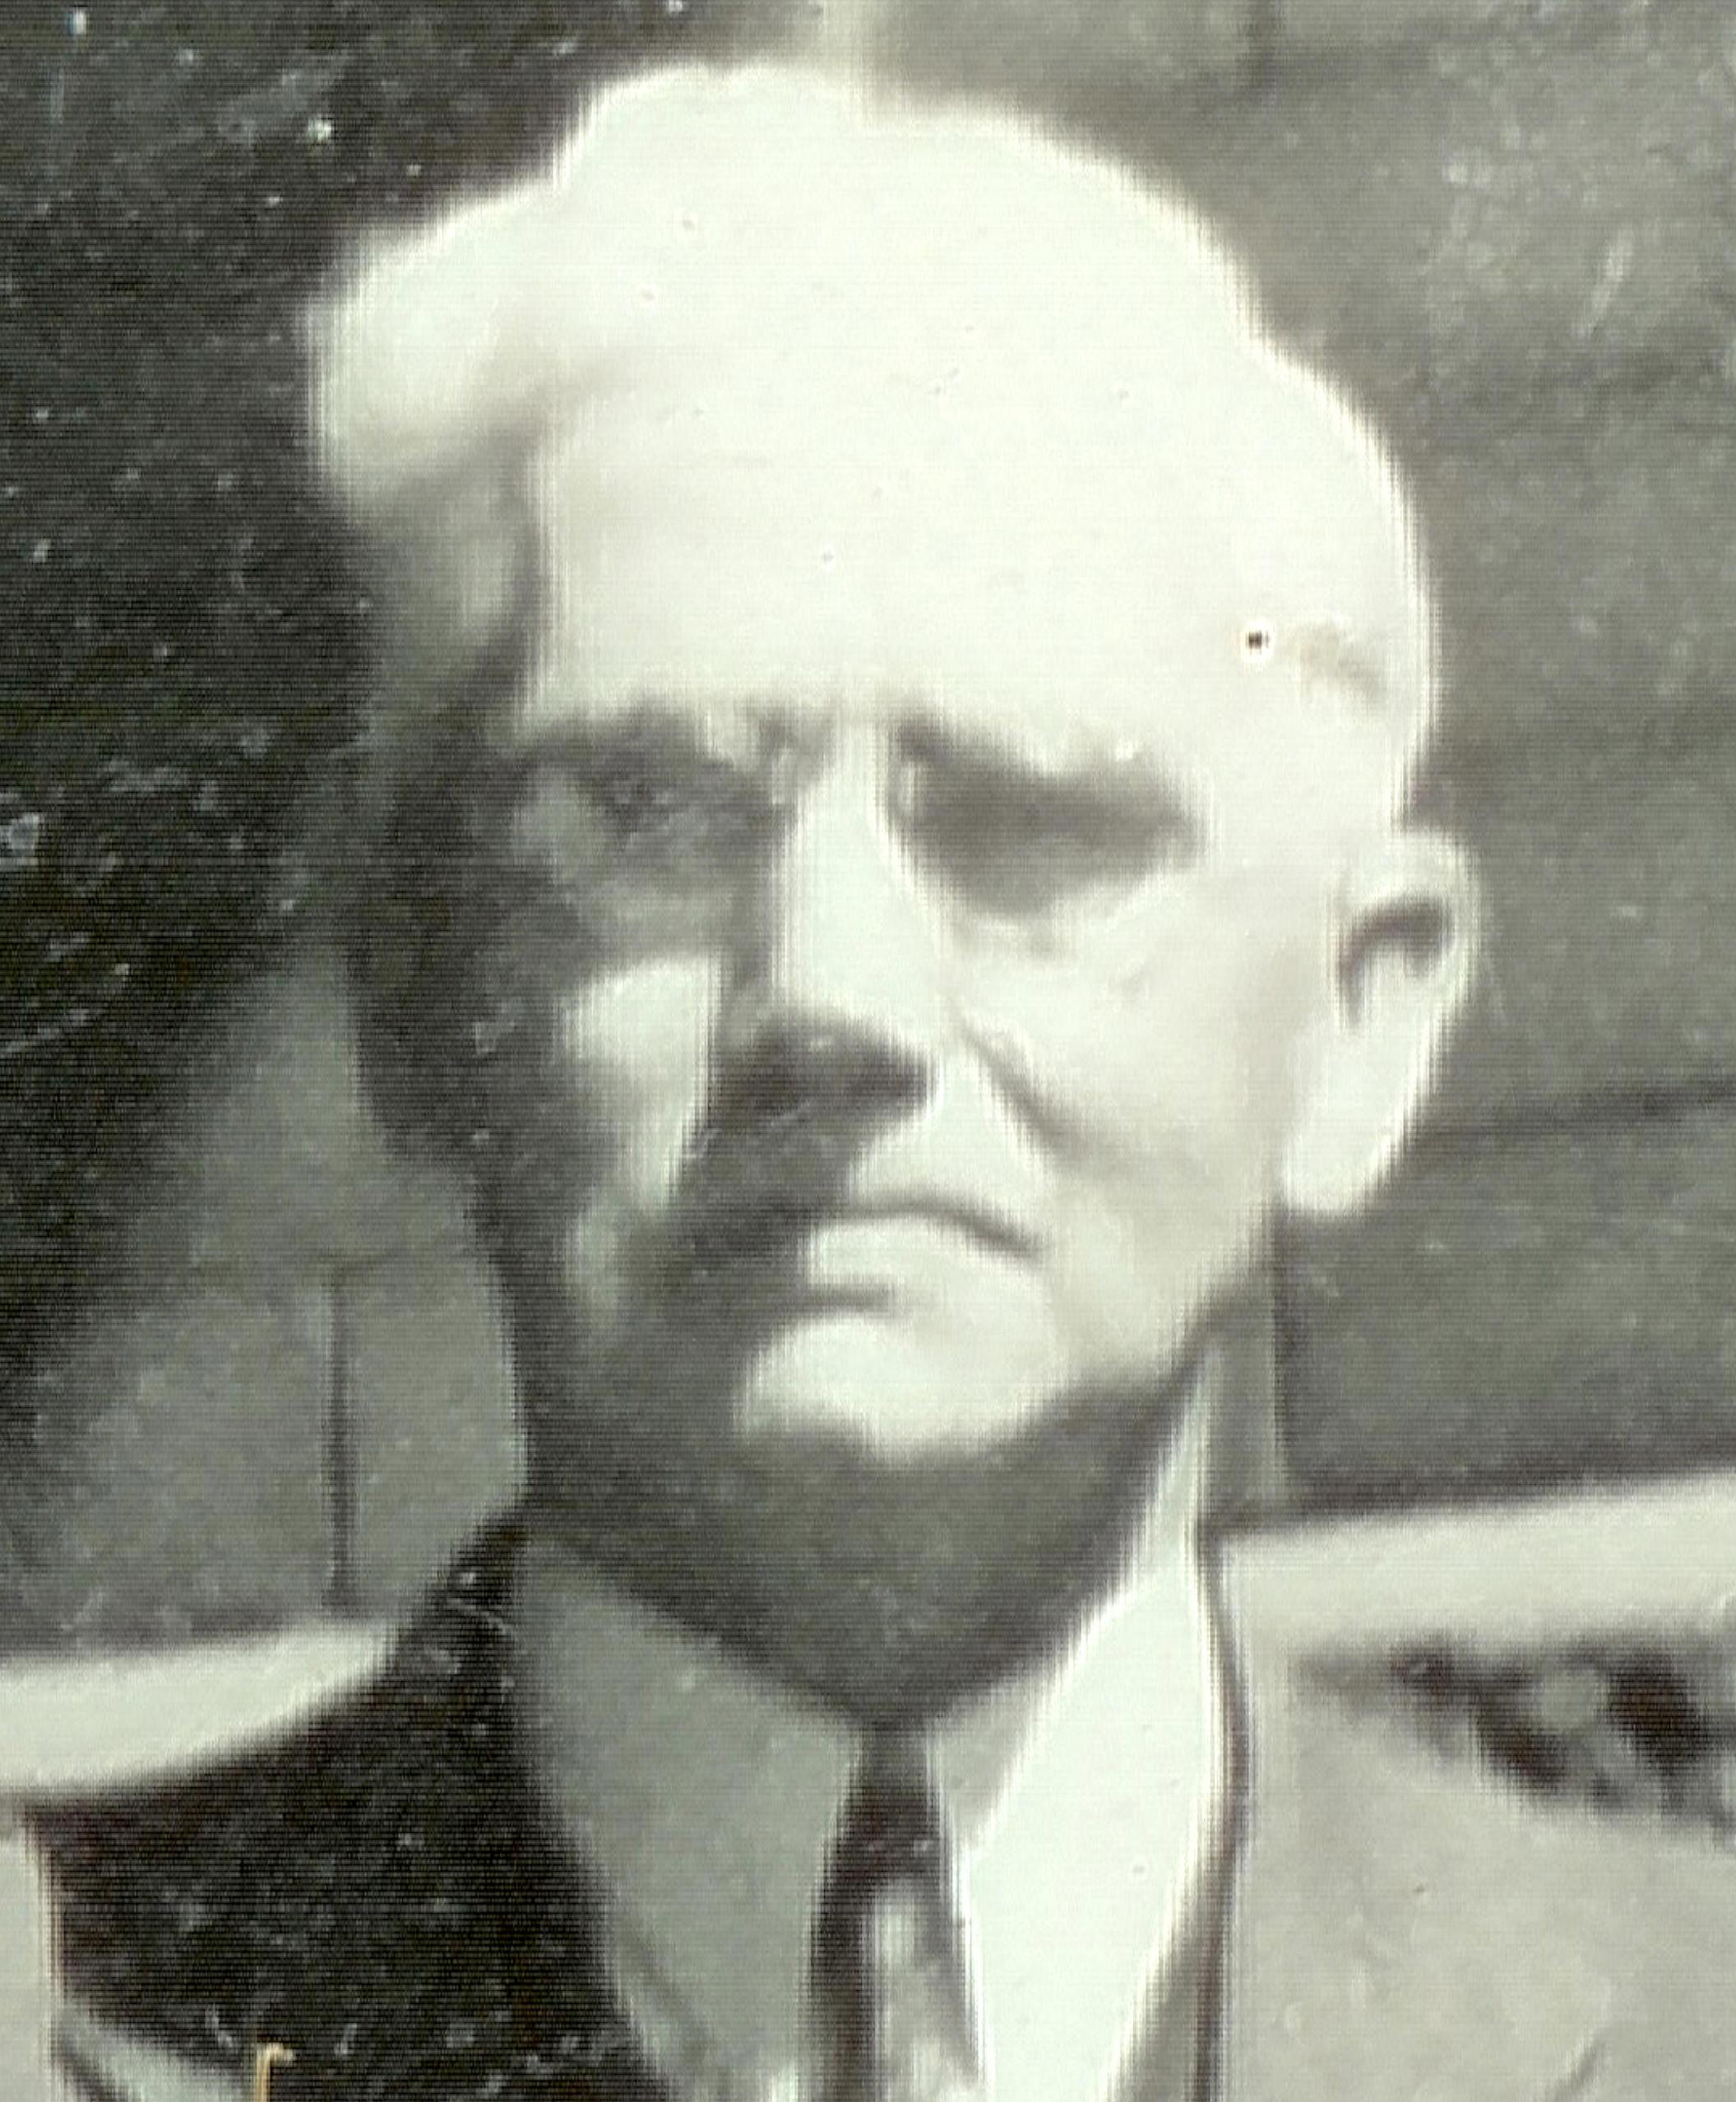 Emerson Clem